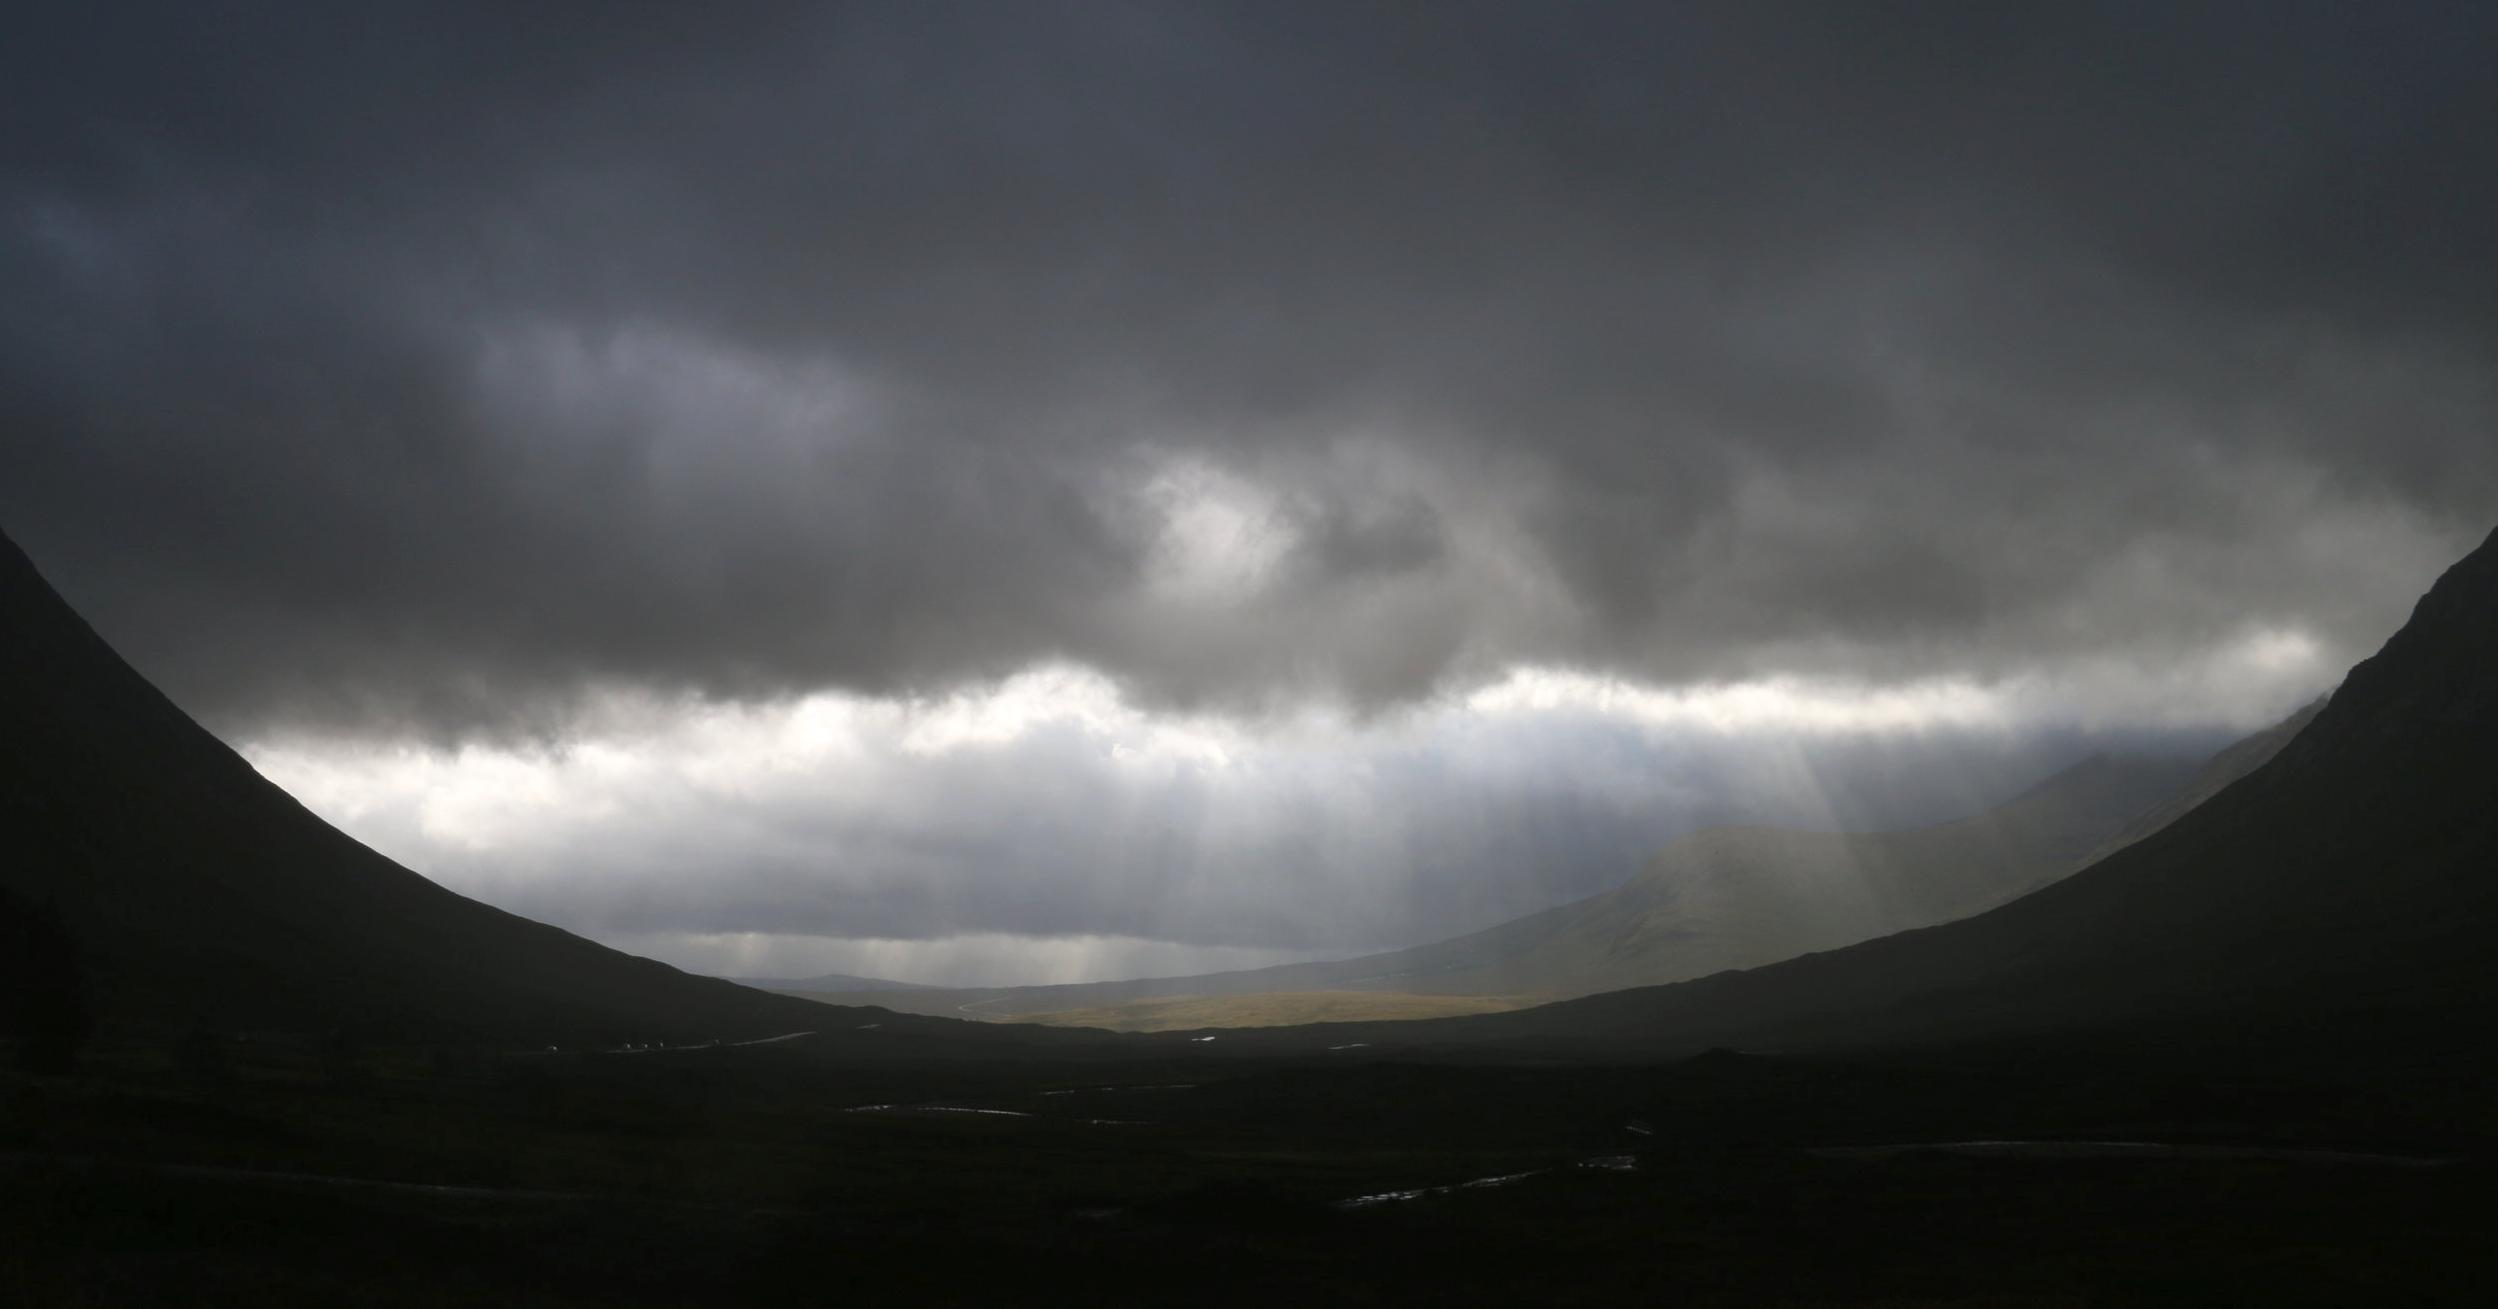 Looking Towards Rannoch Moor from Glen Coe